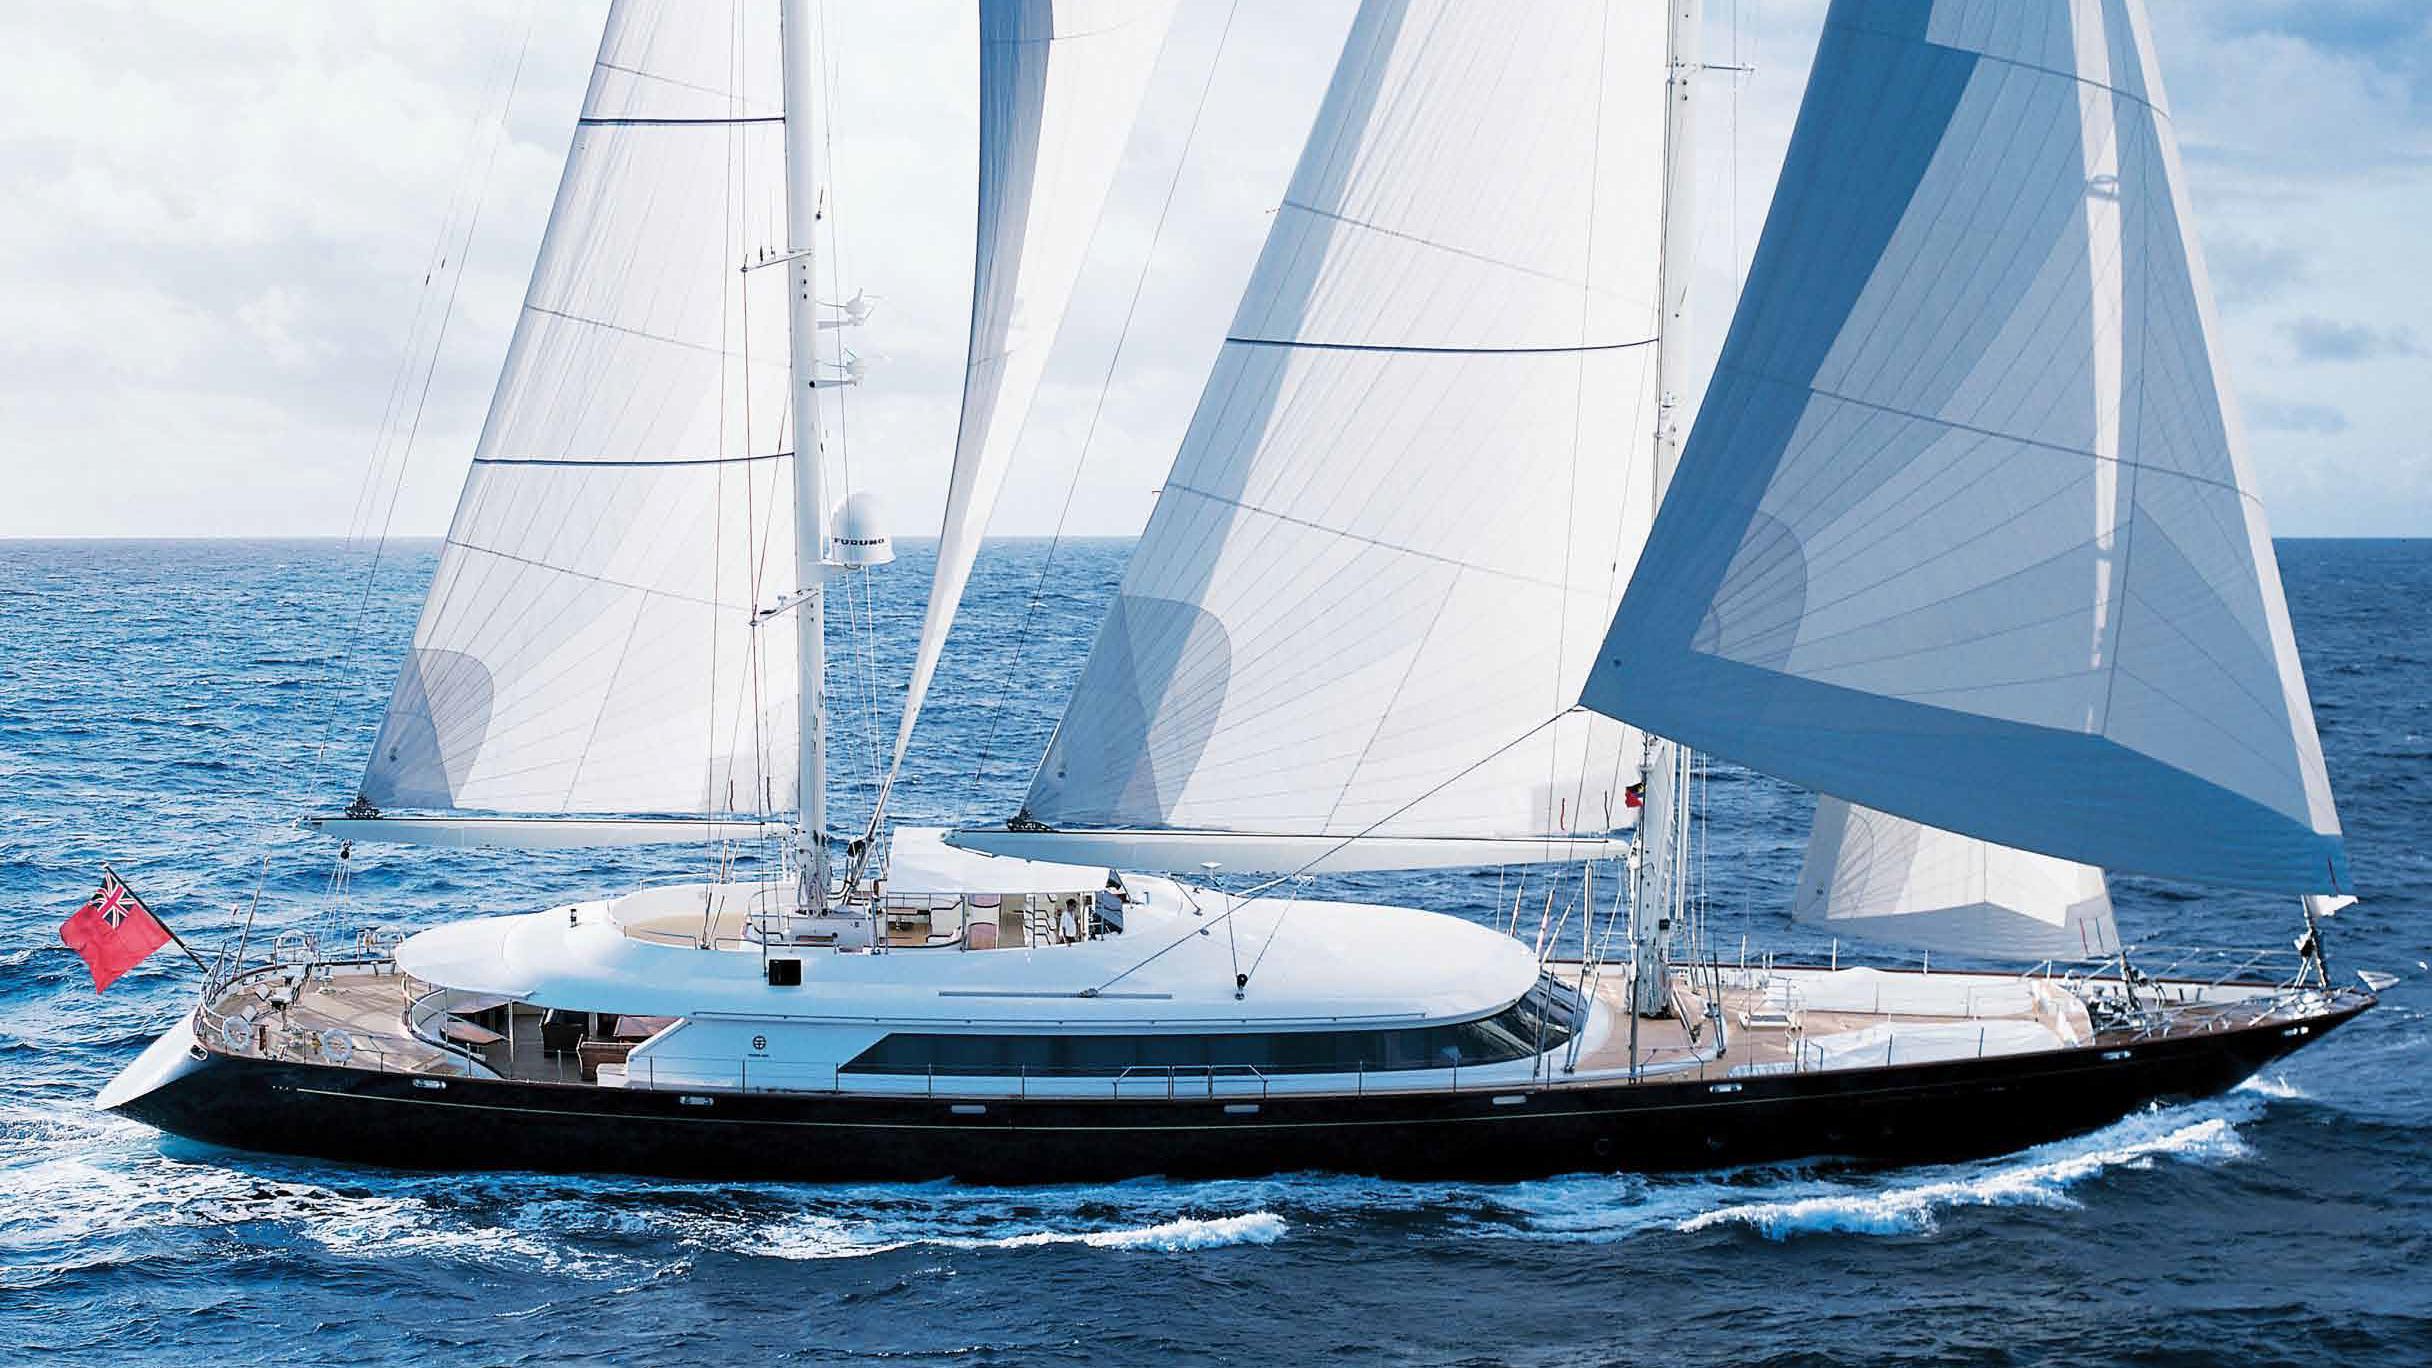 ariane-yacht-at-sea